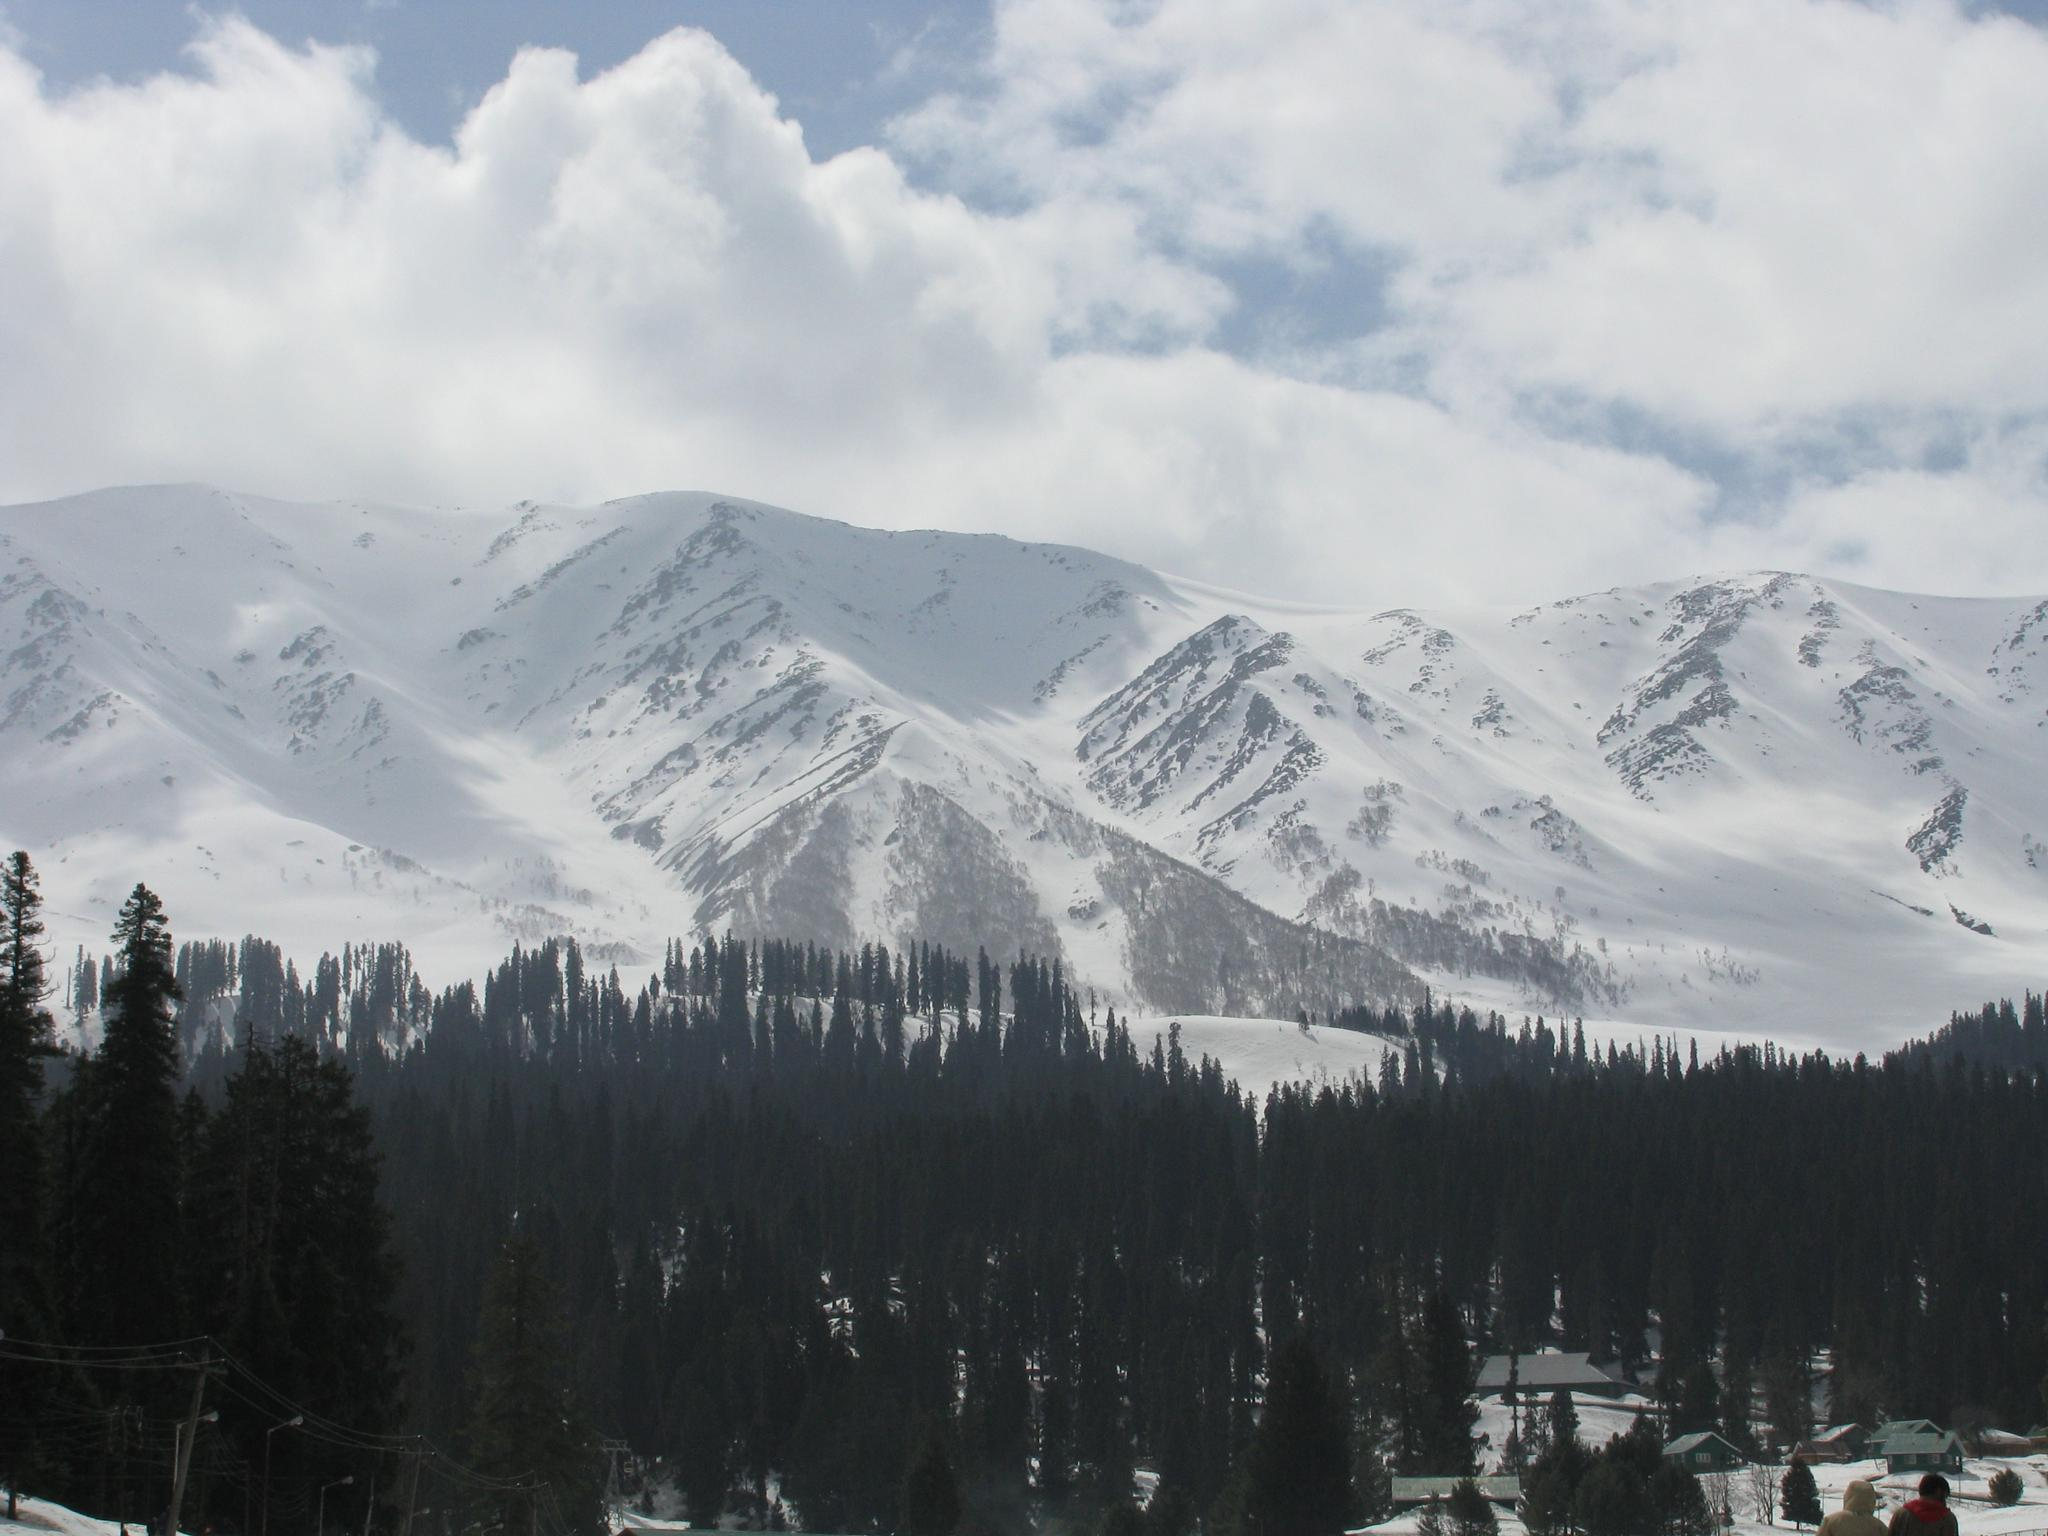 Snow Mountains by Siddhesh Mandlik